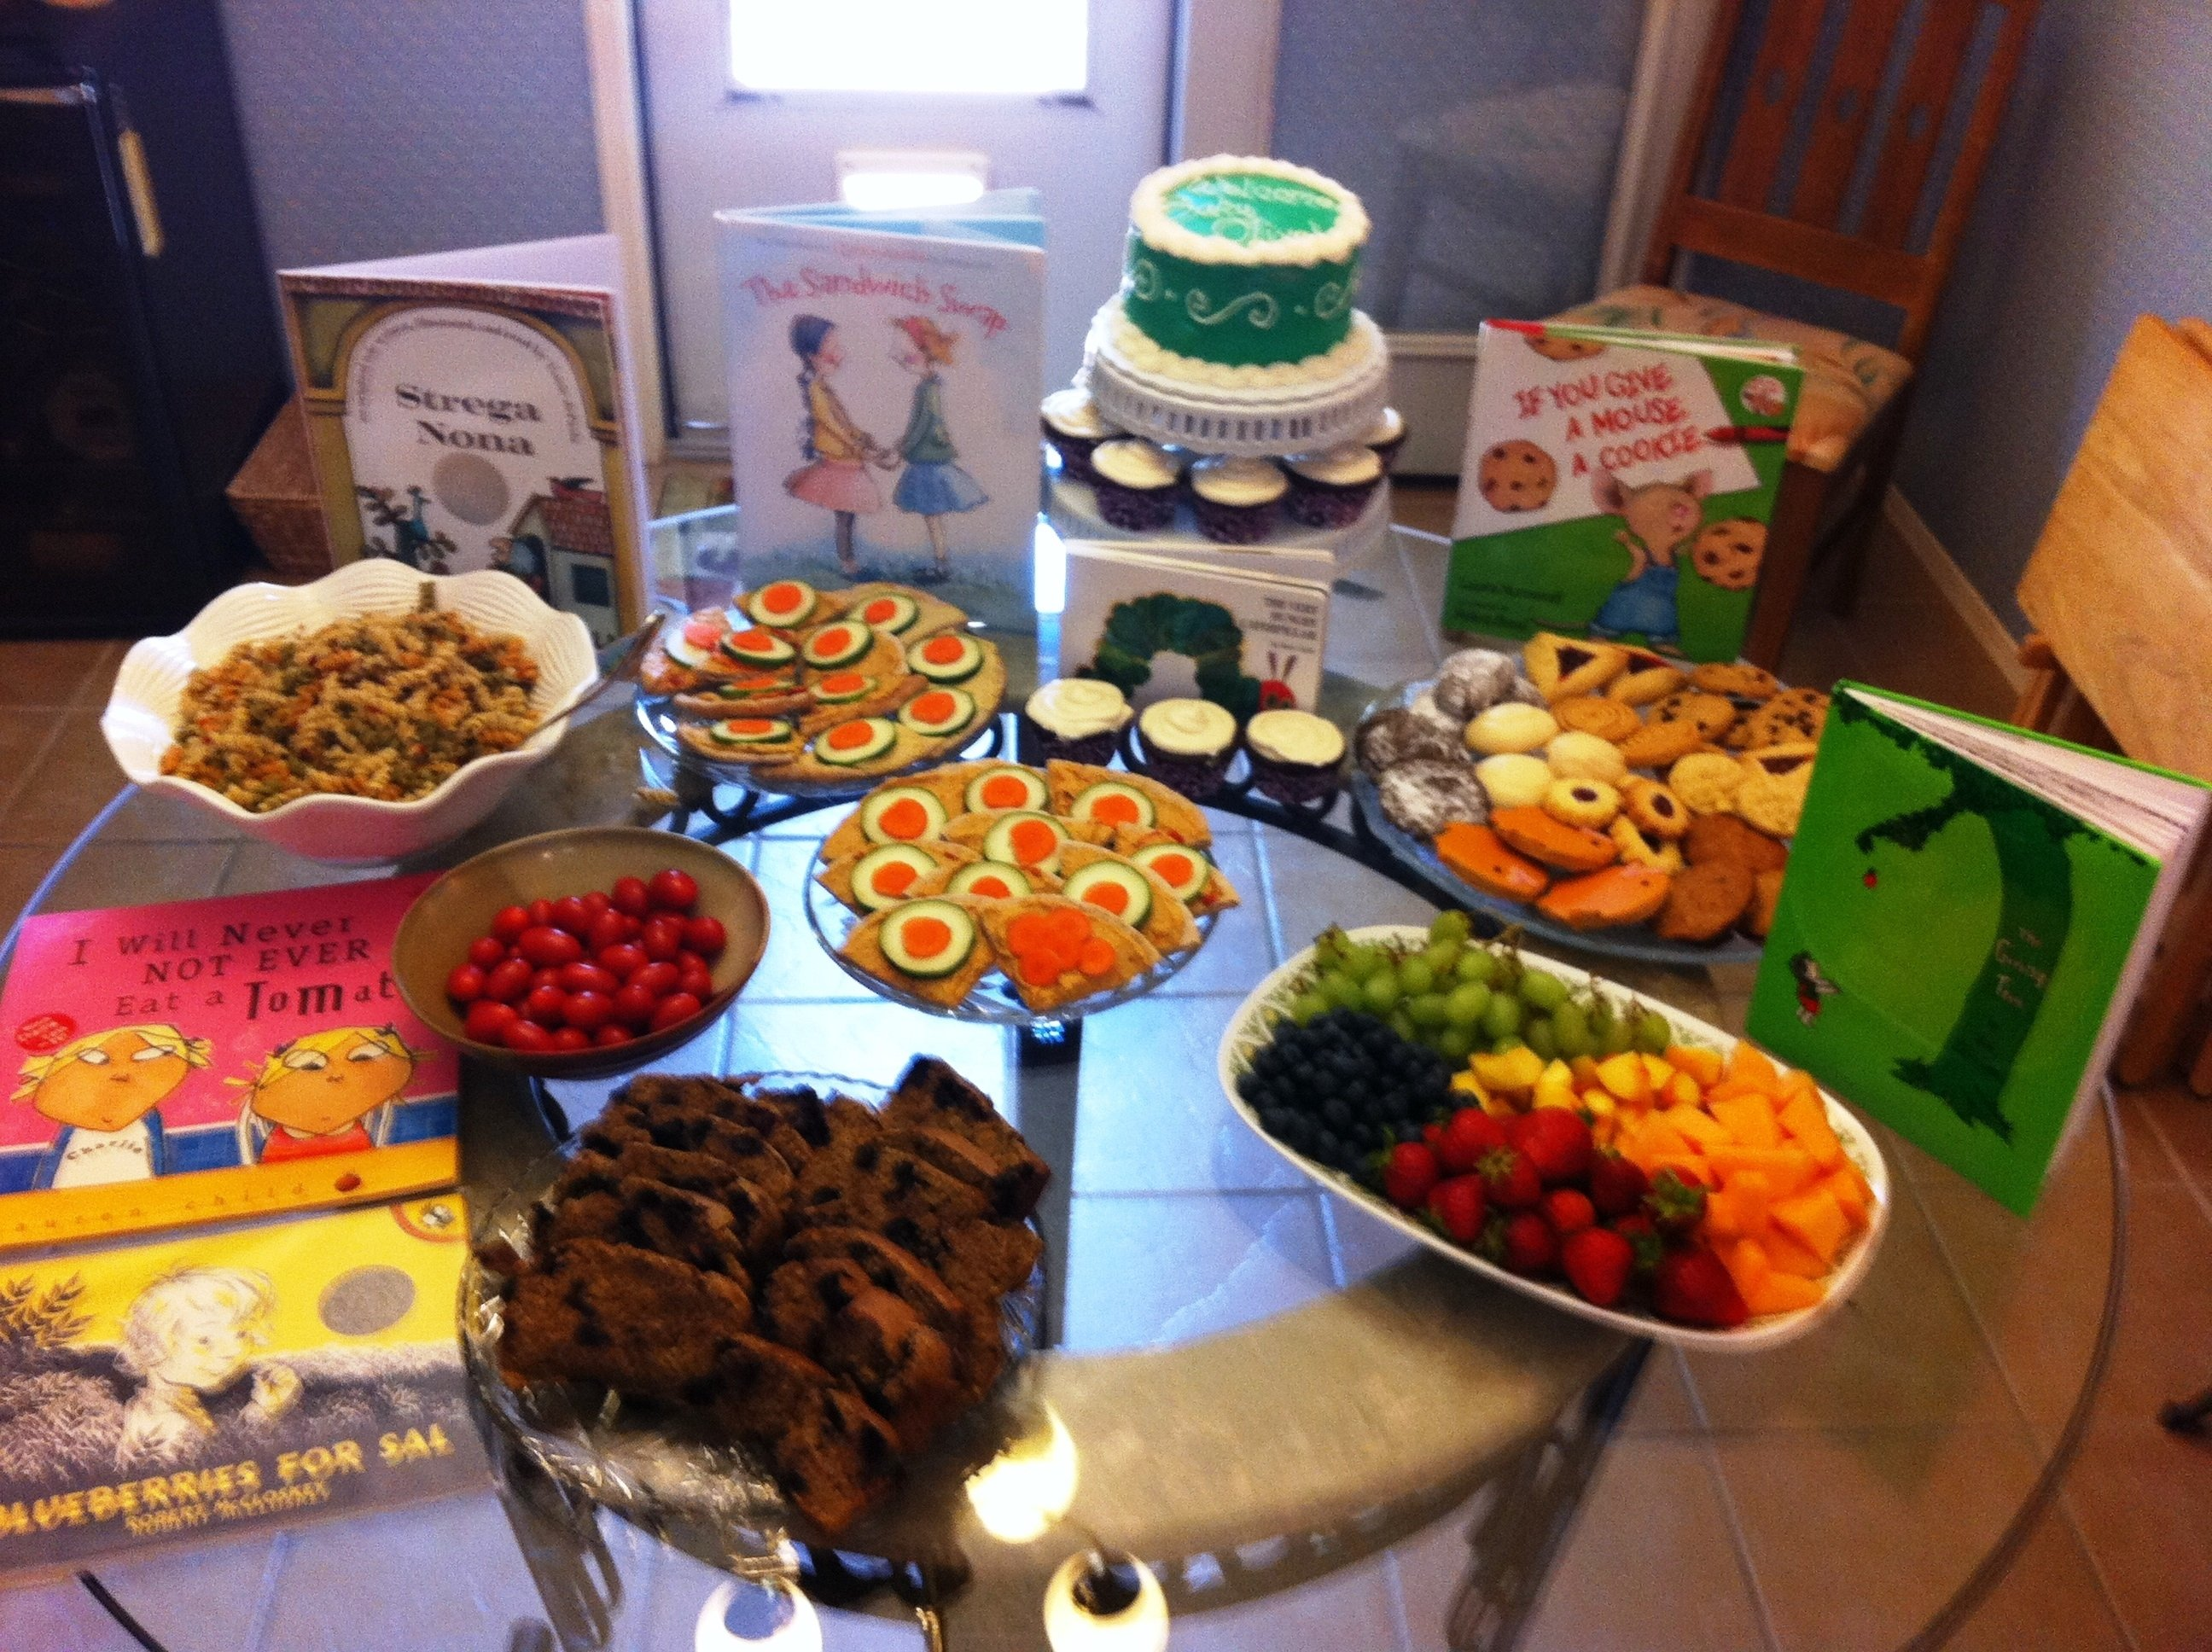 10 Stylish Baby Shower Food Menu Ideas cool baby shower finger food ideas budget and baby shower ideas kits 17 2020